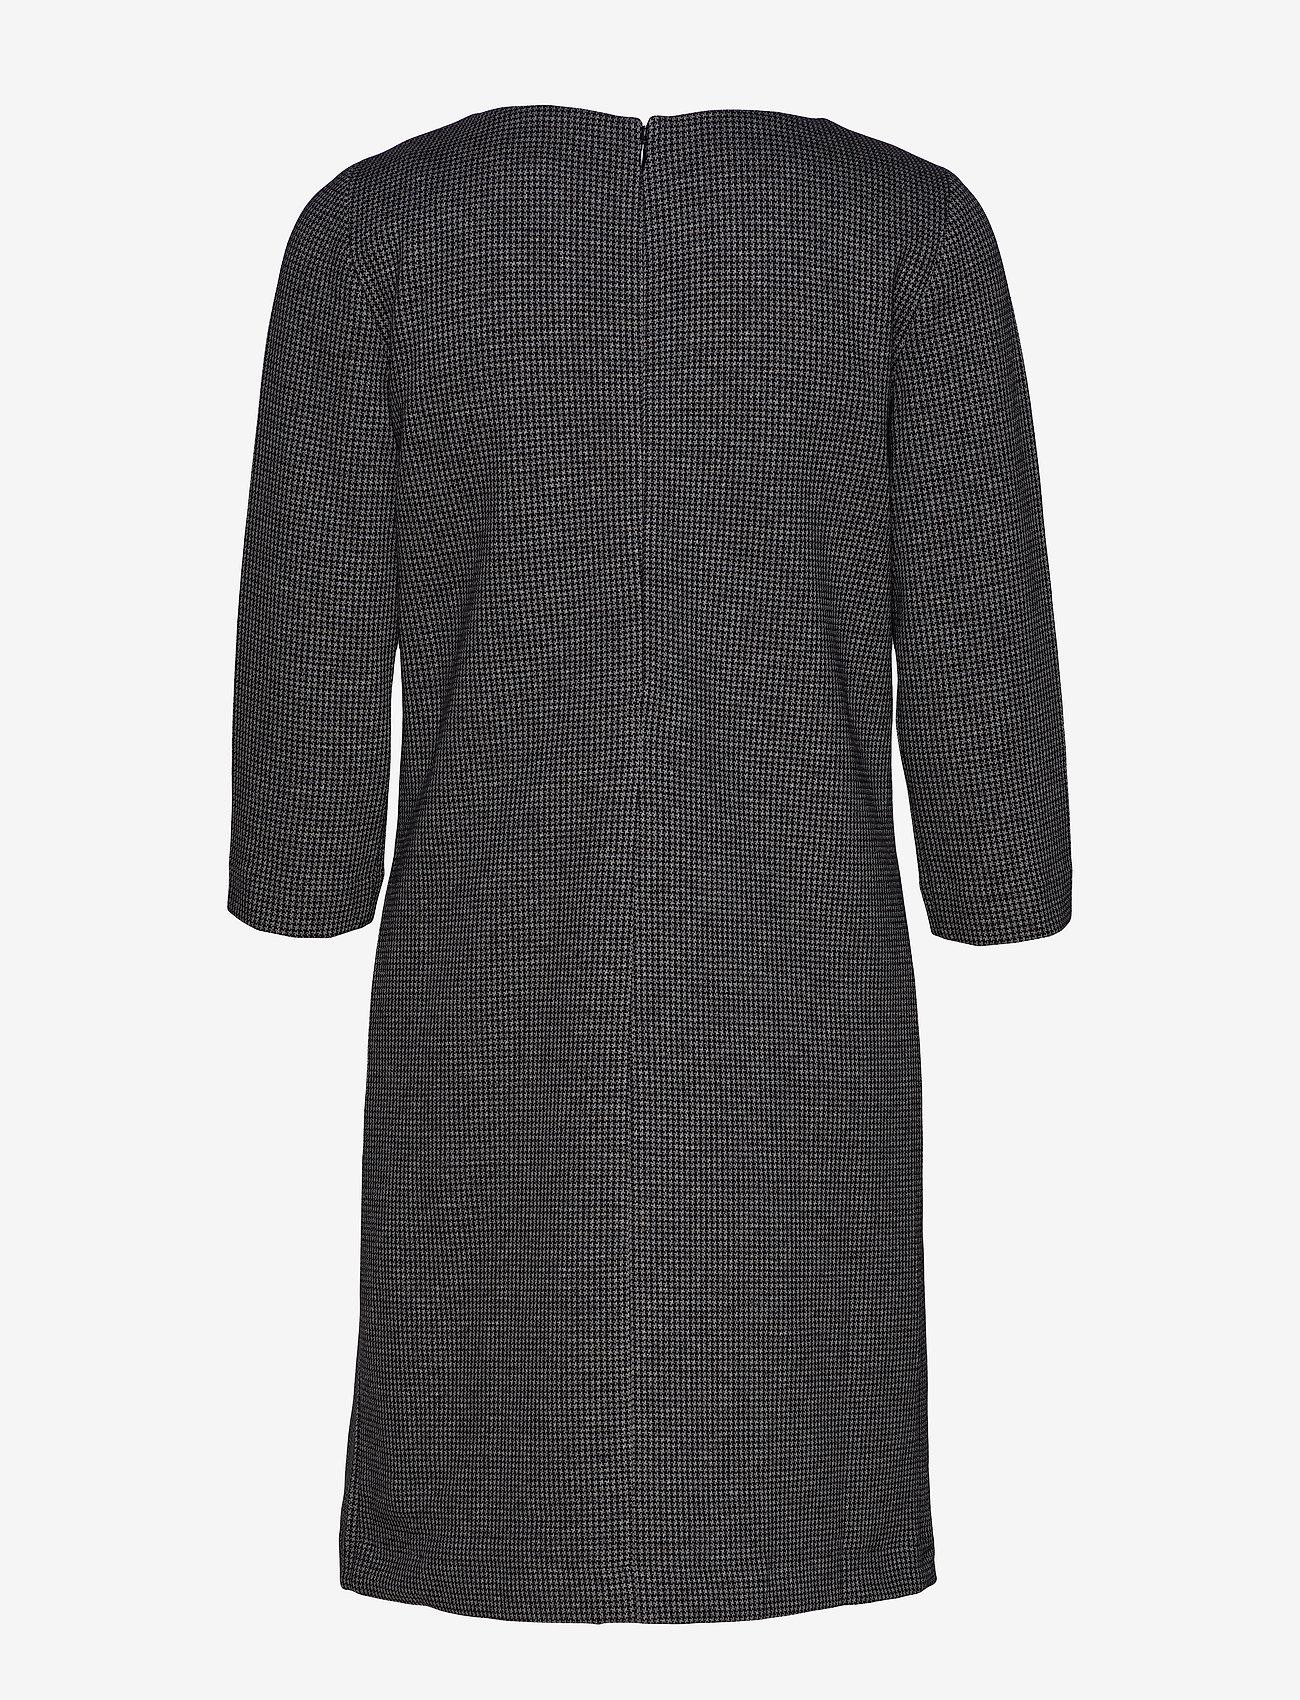 Gant - D1. DOGTOOTH JERSEY CL SHIFT DRESS - midimekot - dark grey melange